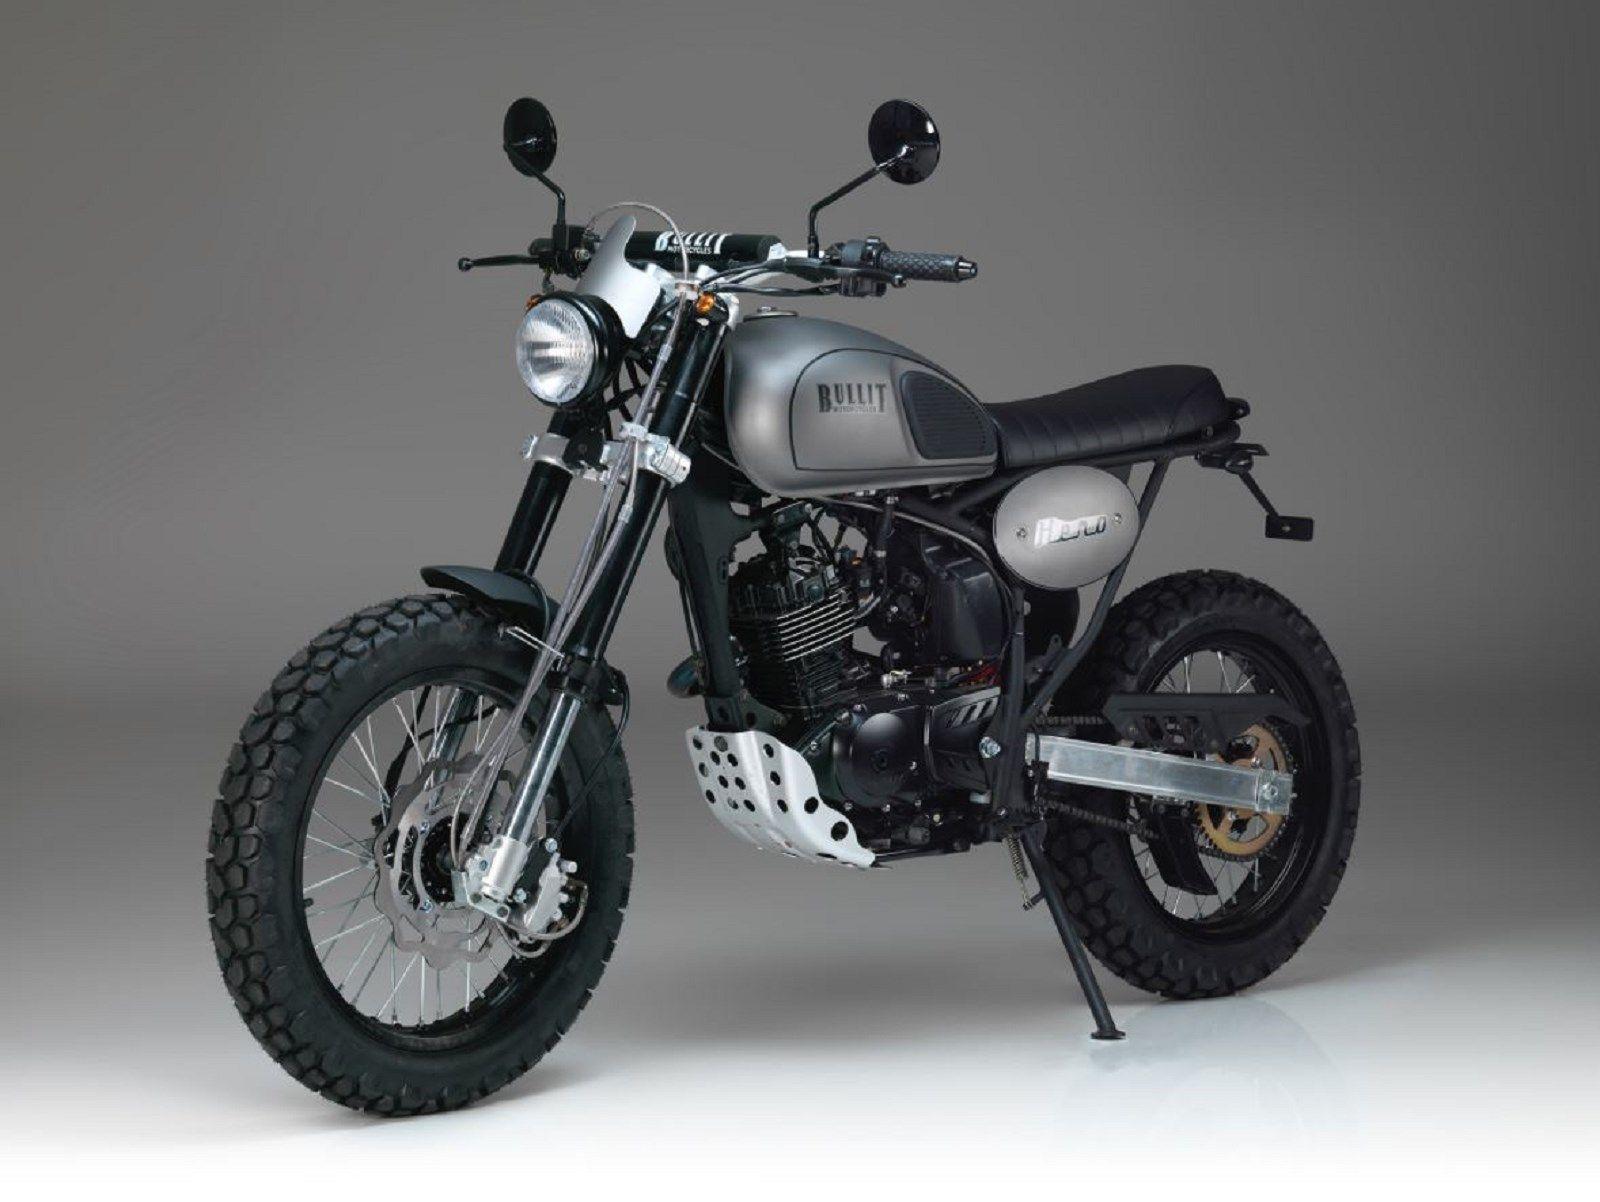 La Nouvelle Bullit Héro 125cc Moto Scrambler Motorcycle